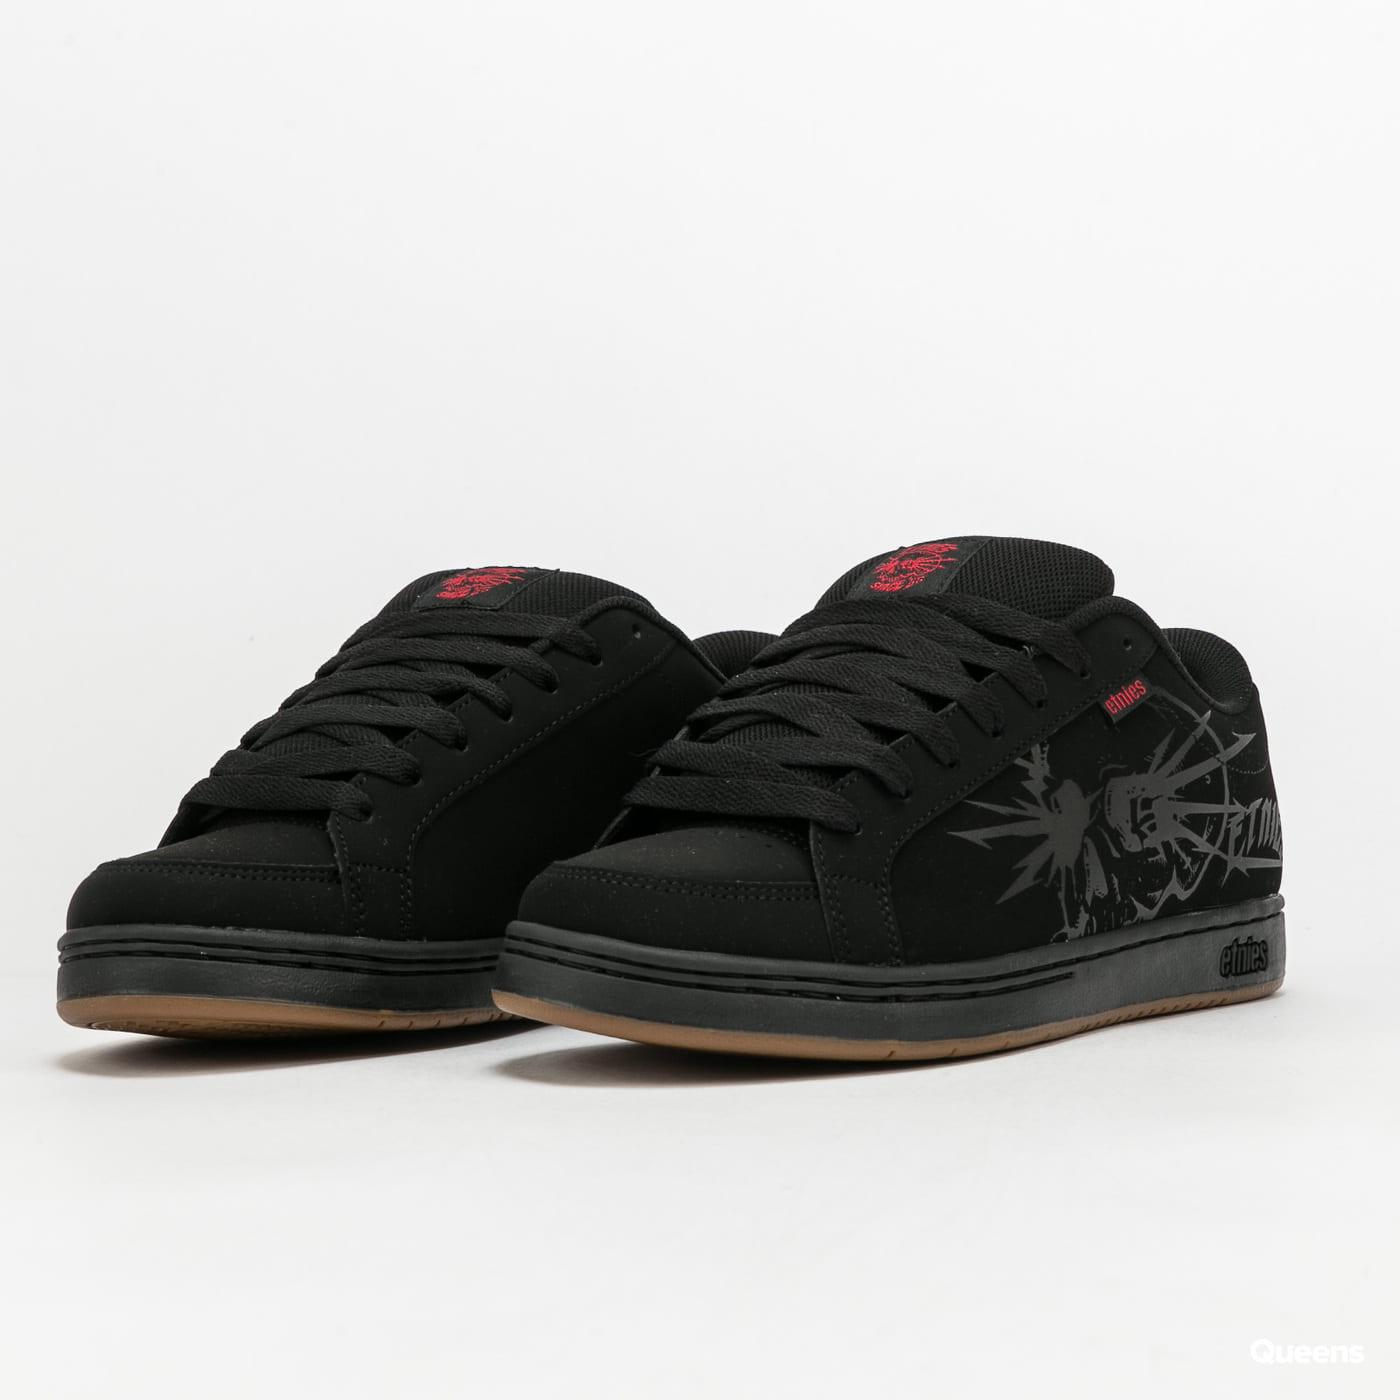 etnies Kingpin 2 black / black / print